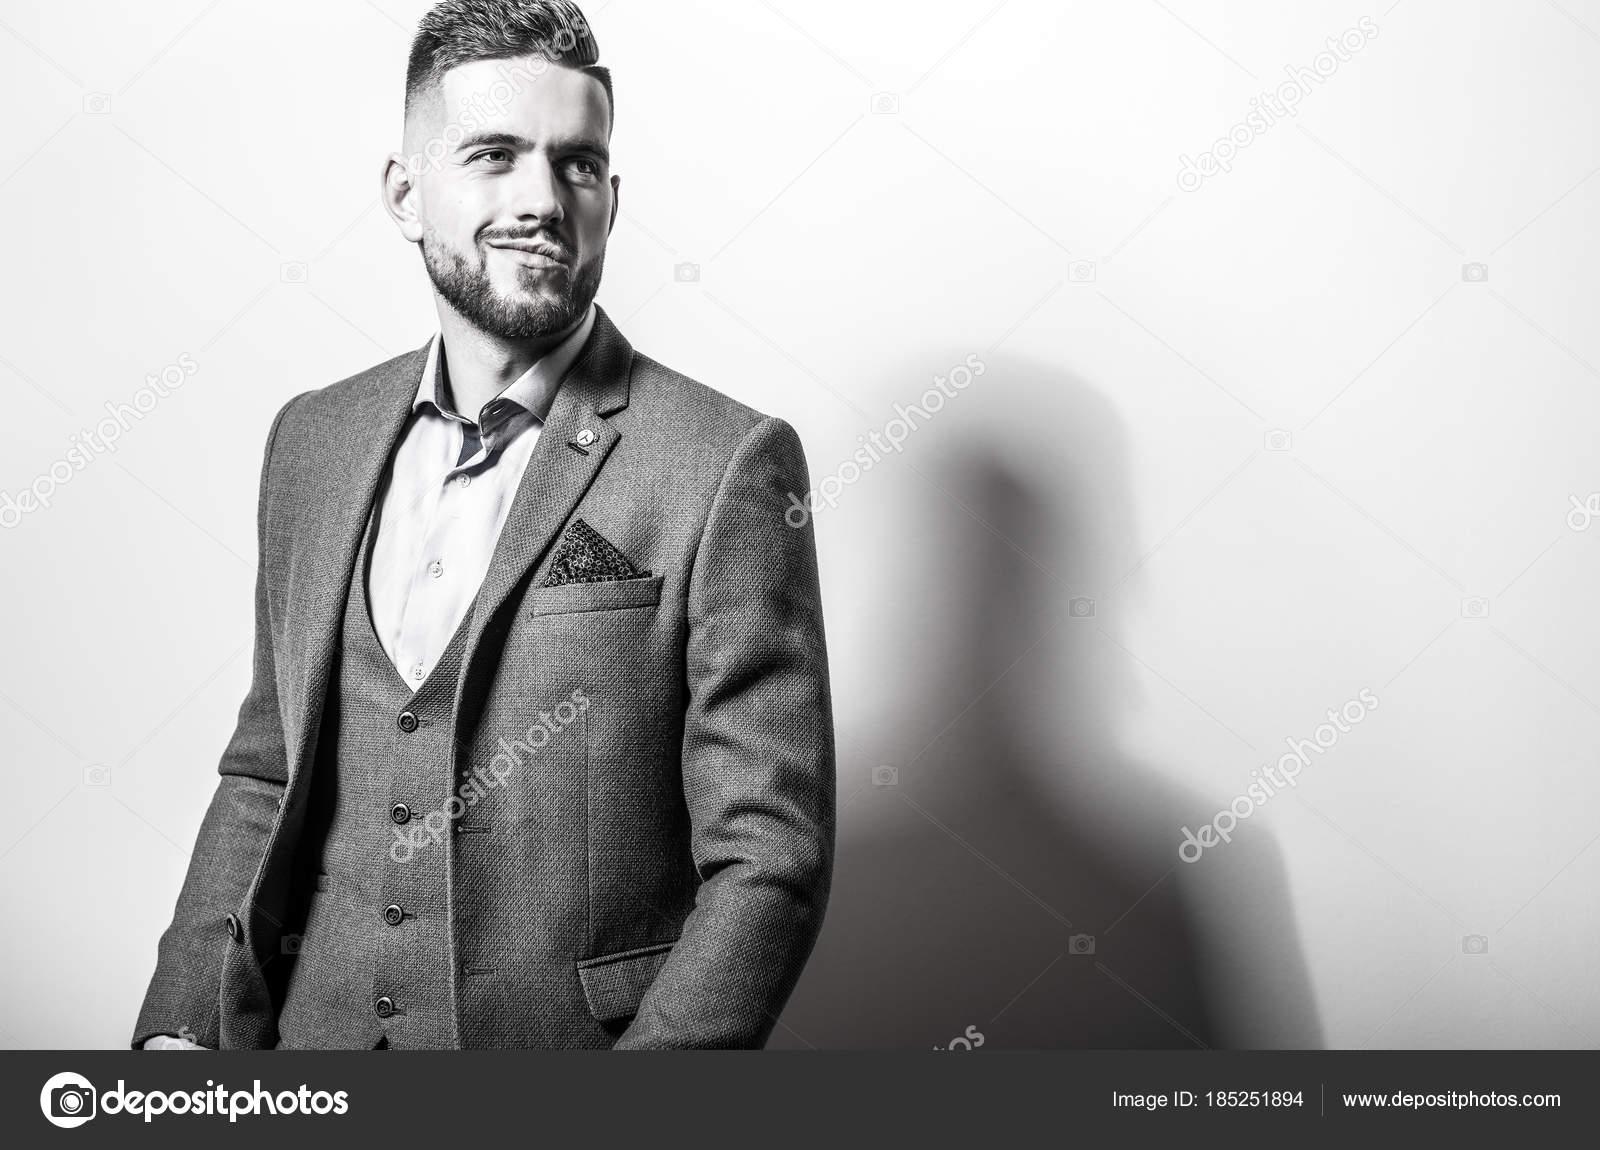 Handsome Young Elegant Man In Grey Jacket Pose Against Studio